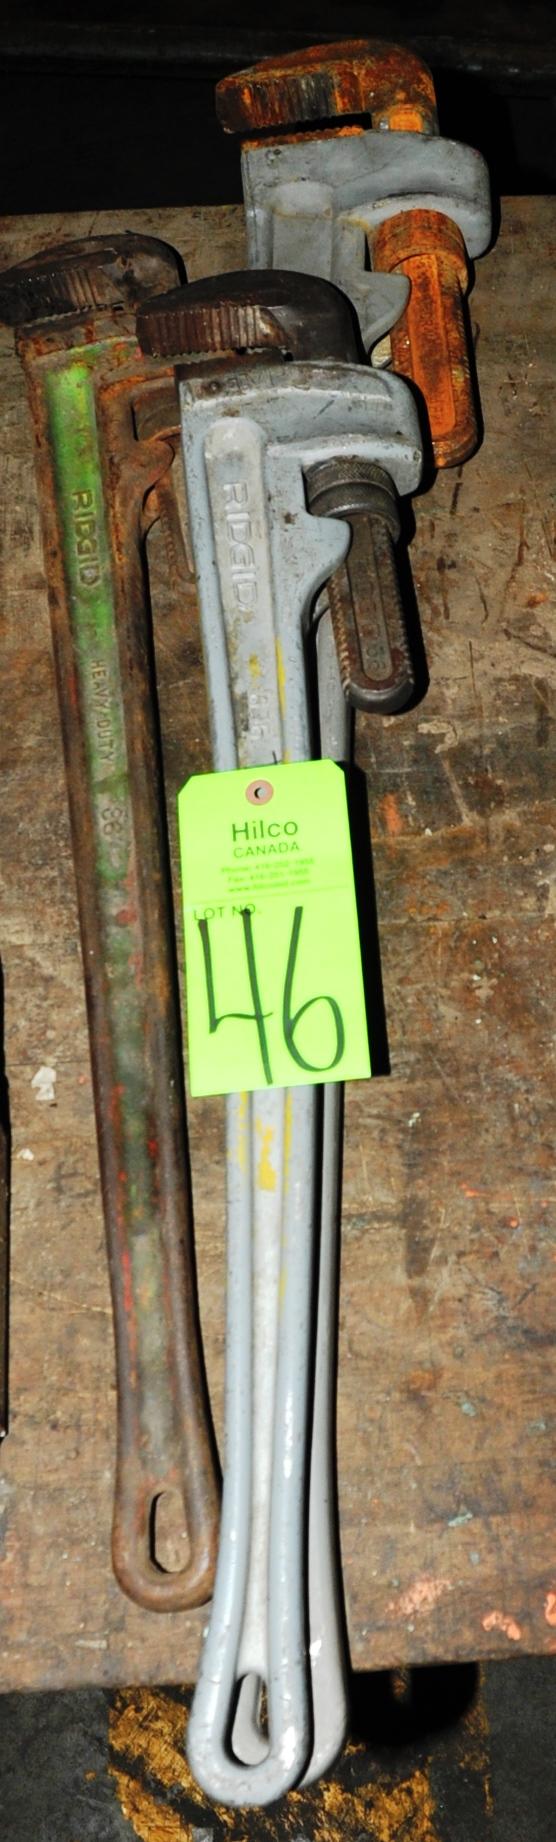 "Lot 46 - Asst. Ridgid 46"", 36"" Aluminum Pipe Wrenches"